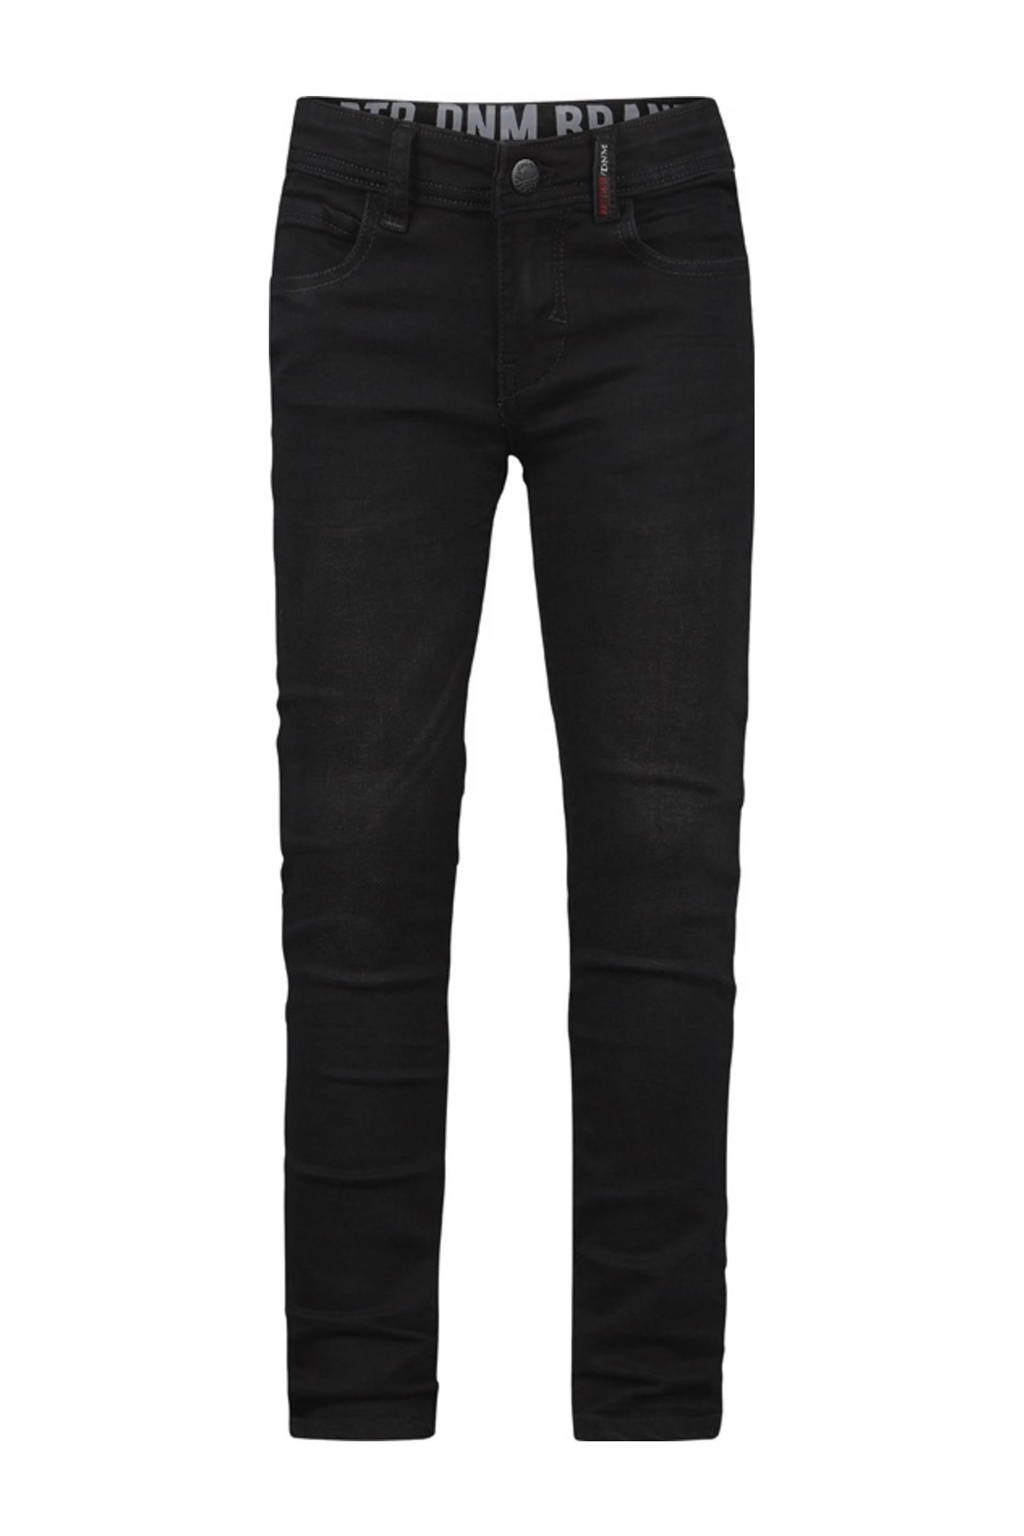 Retour Denim slim fit jeans Luigi black denim, Black denim